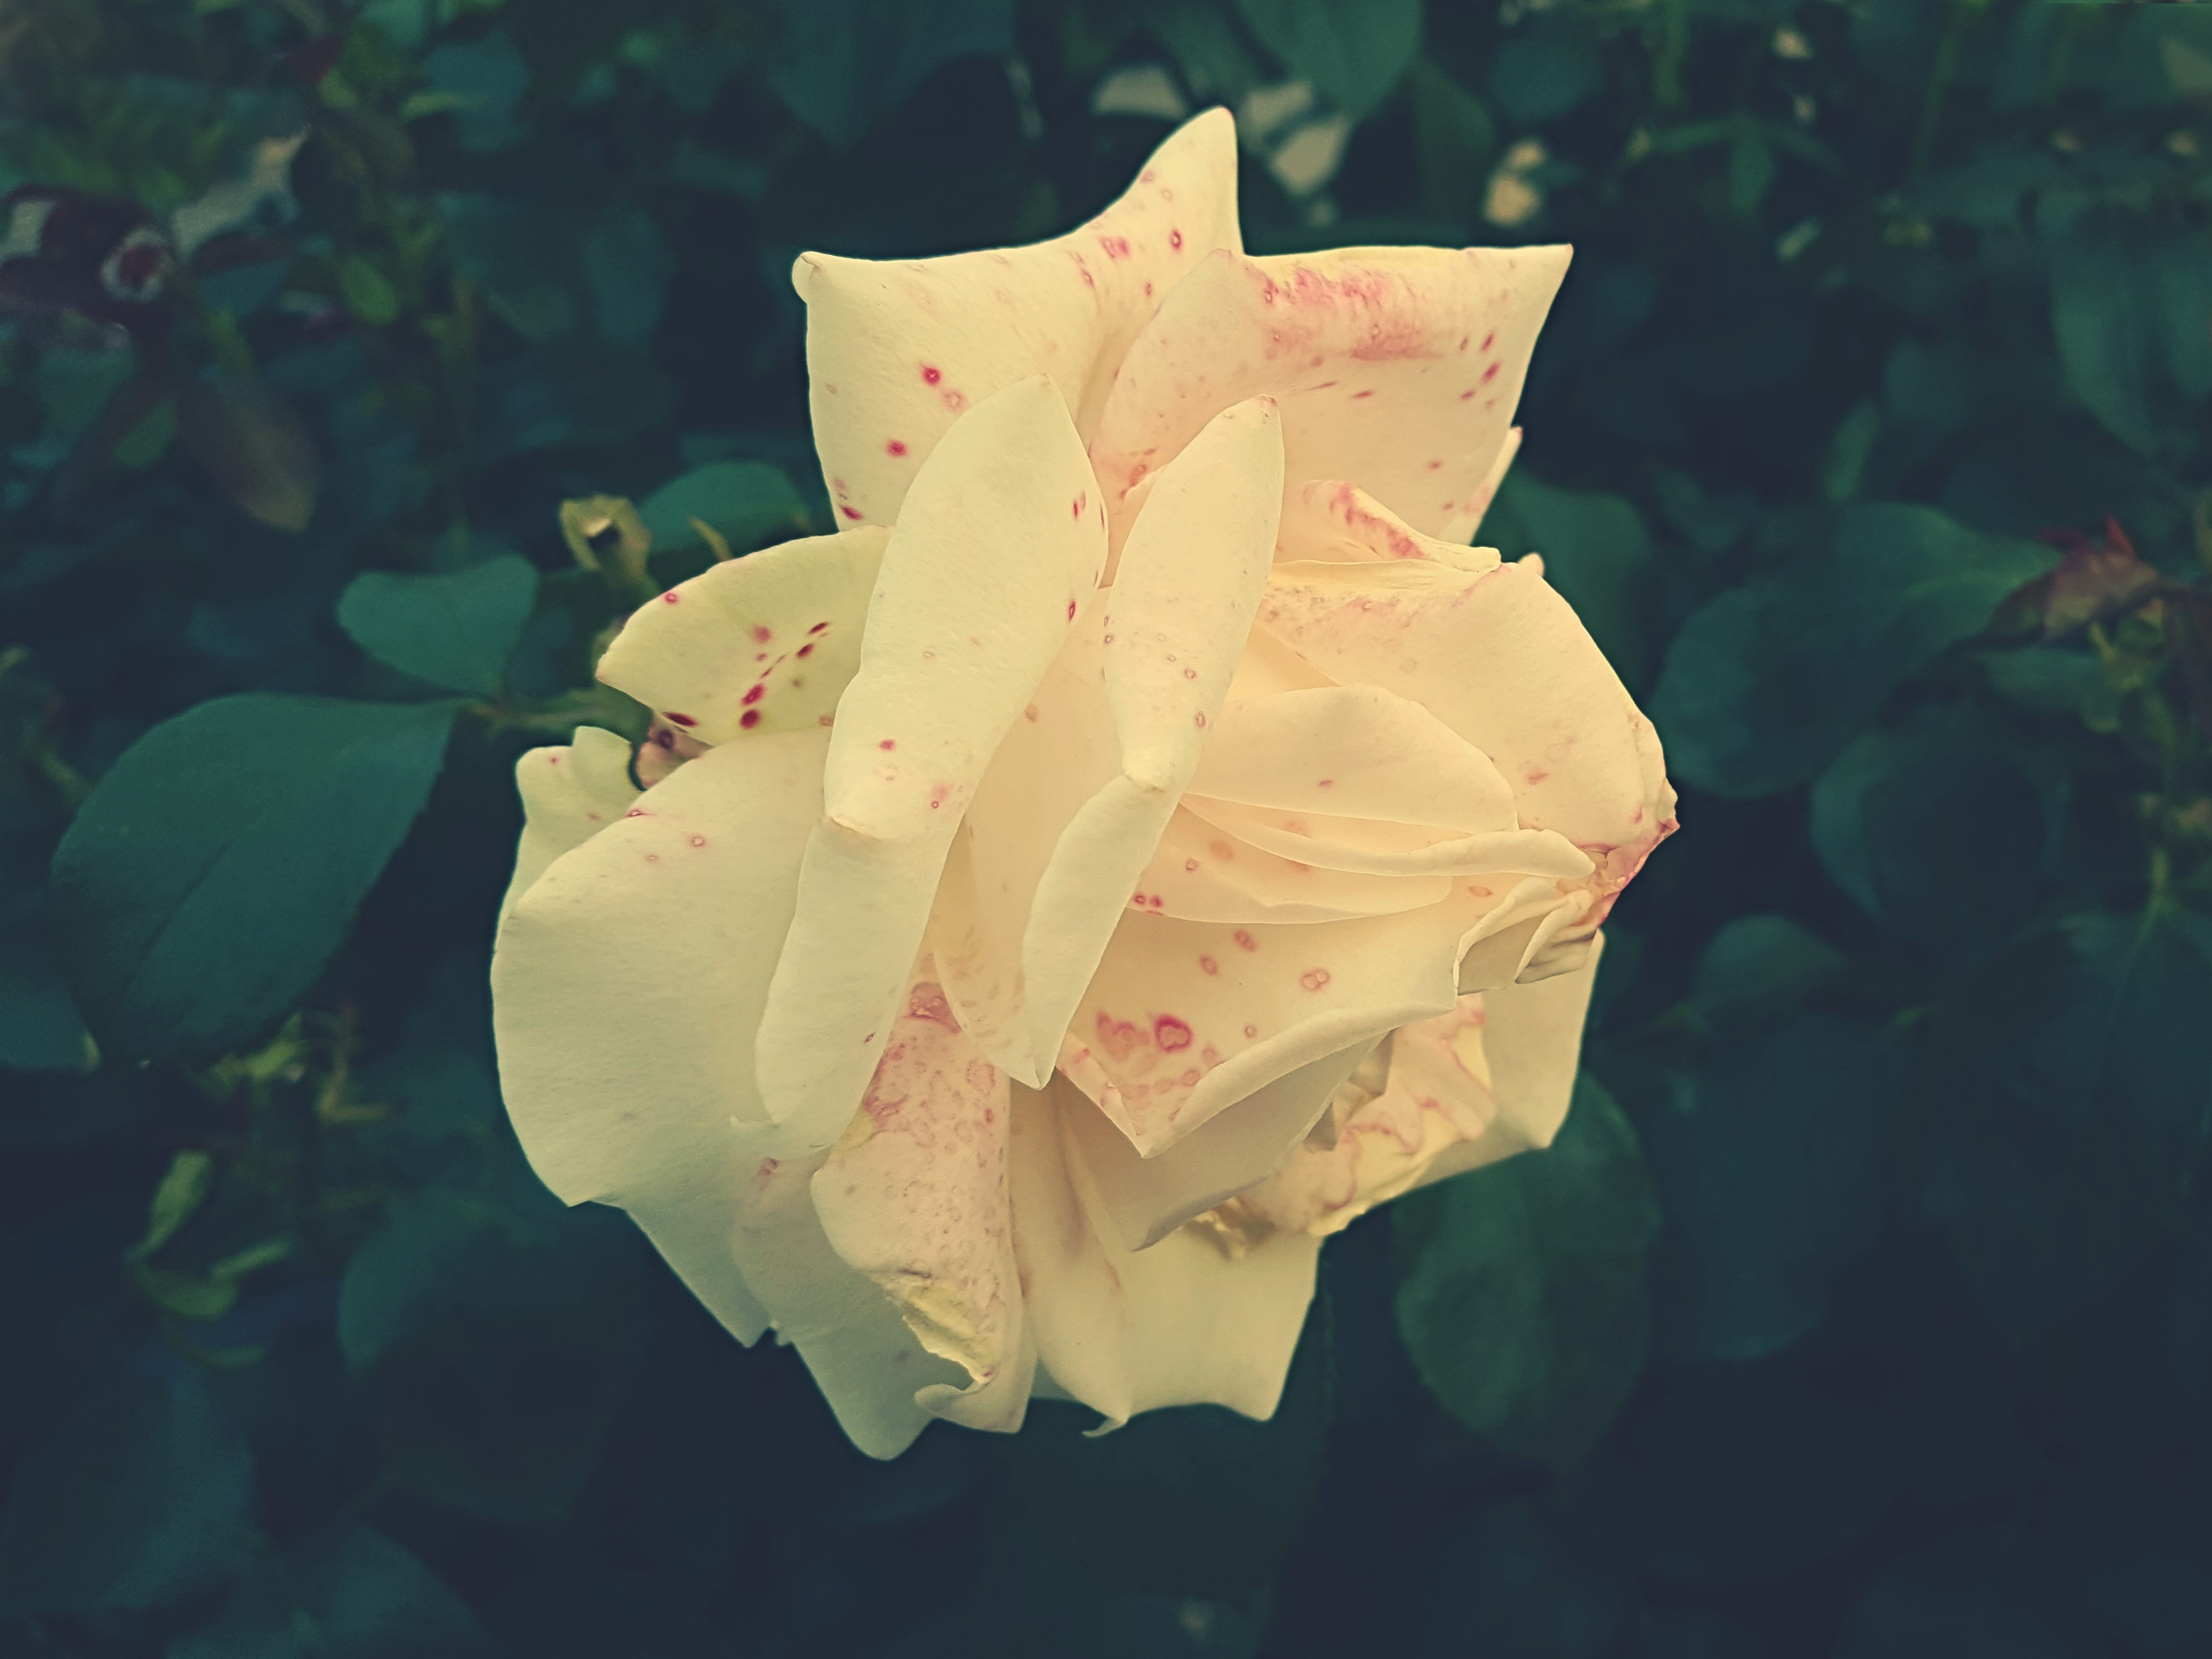 Yellow Rose, Bloom, Garden, Summer, Petals, HQ Photo